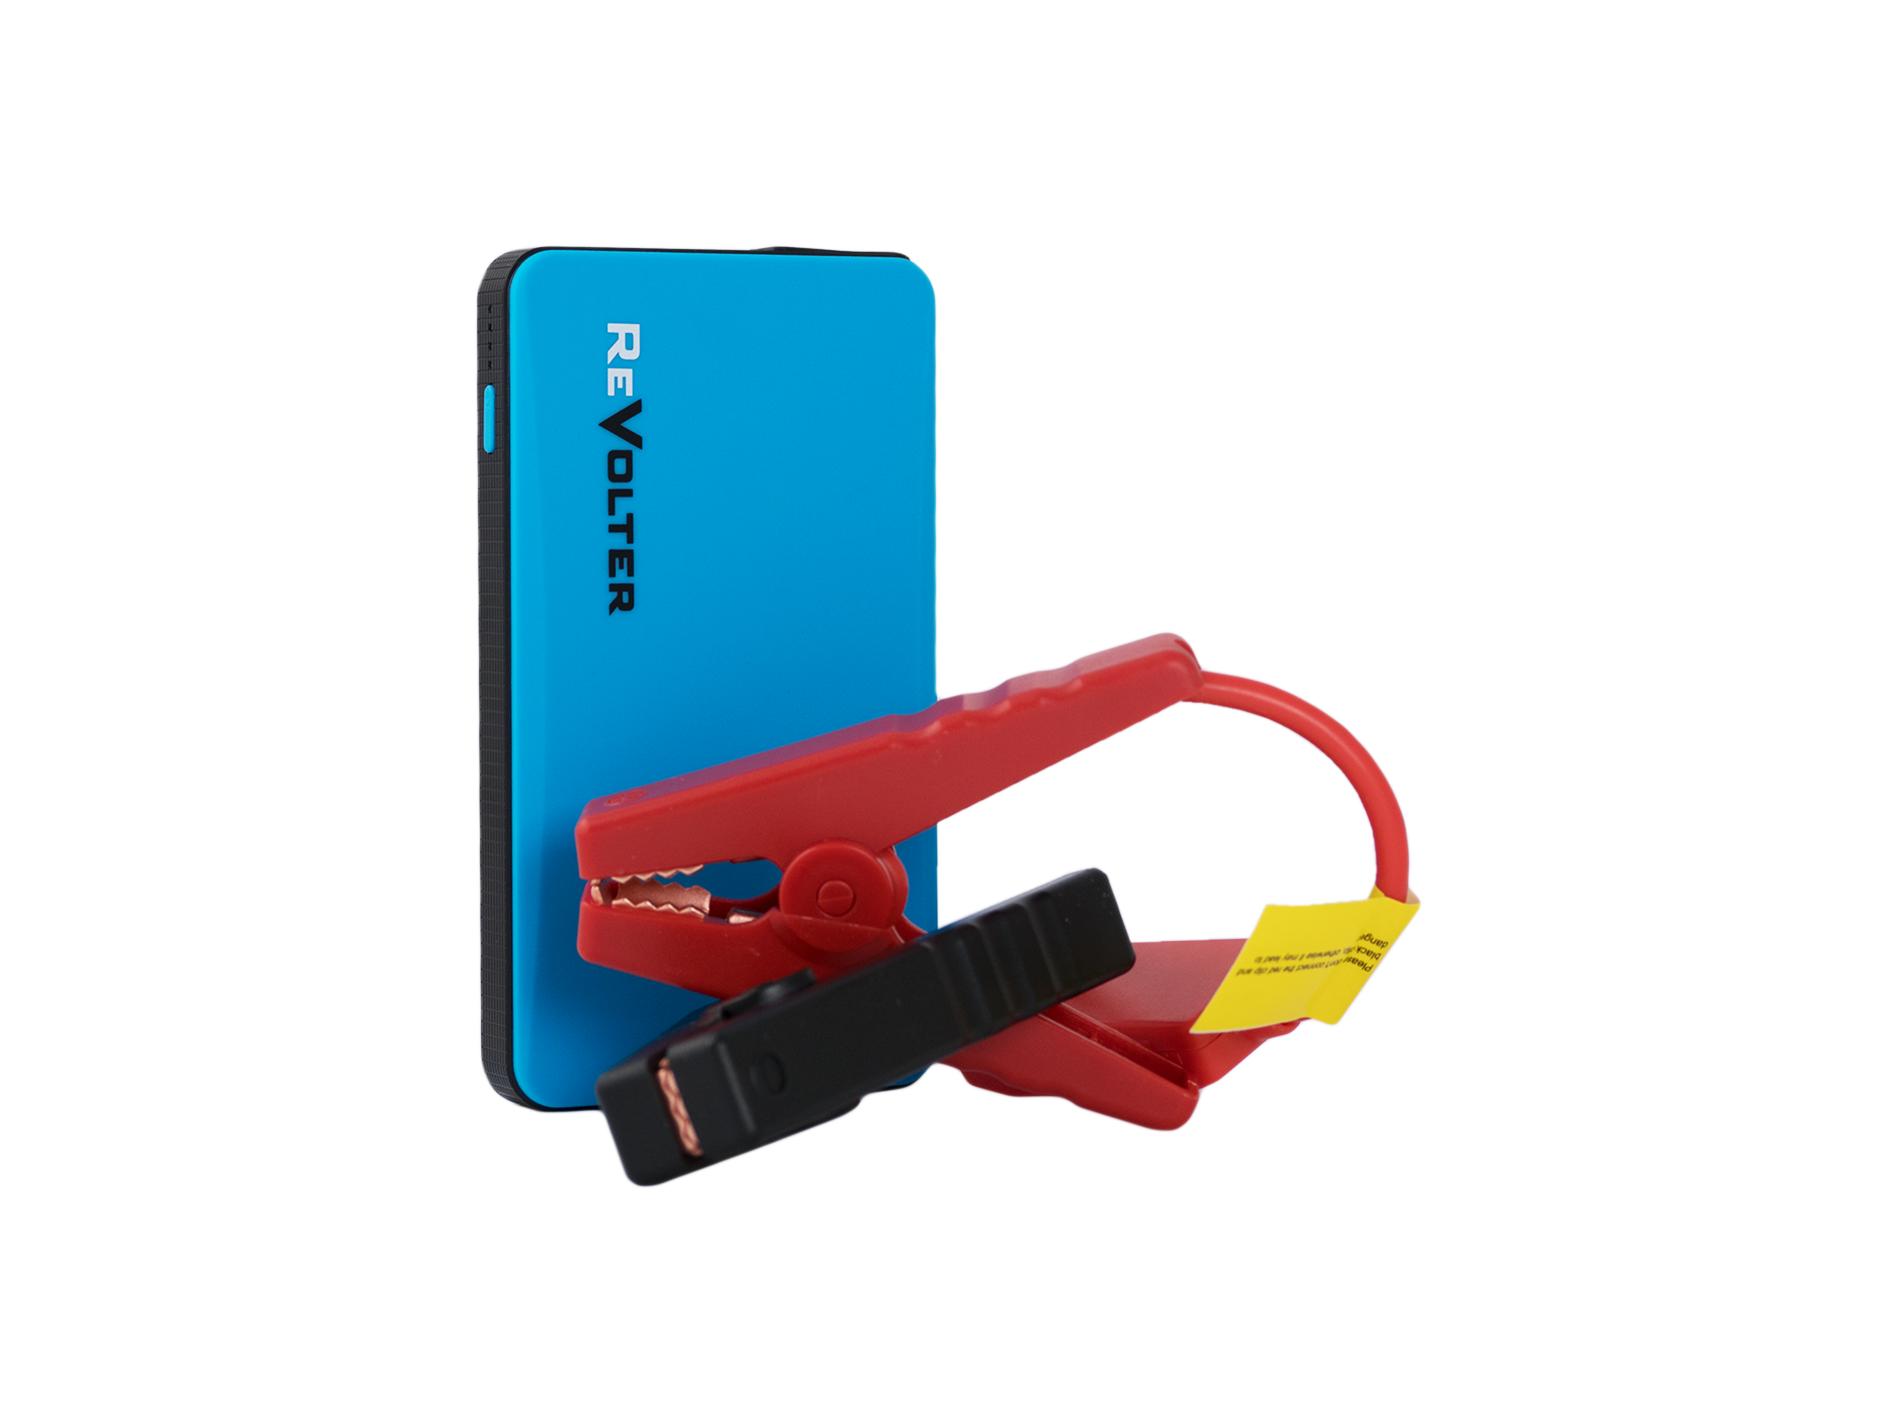 Пуско-зарядное устройство ReVolter Pulsar синий (+ Антисептик-спрей для рук в подарок!)